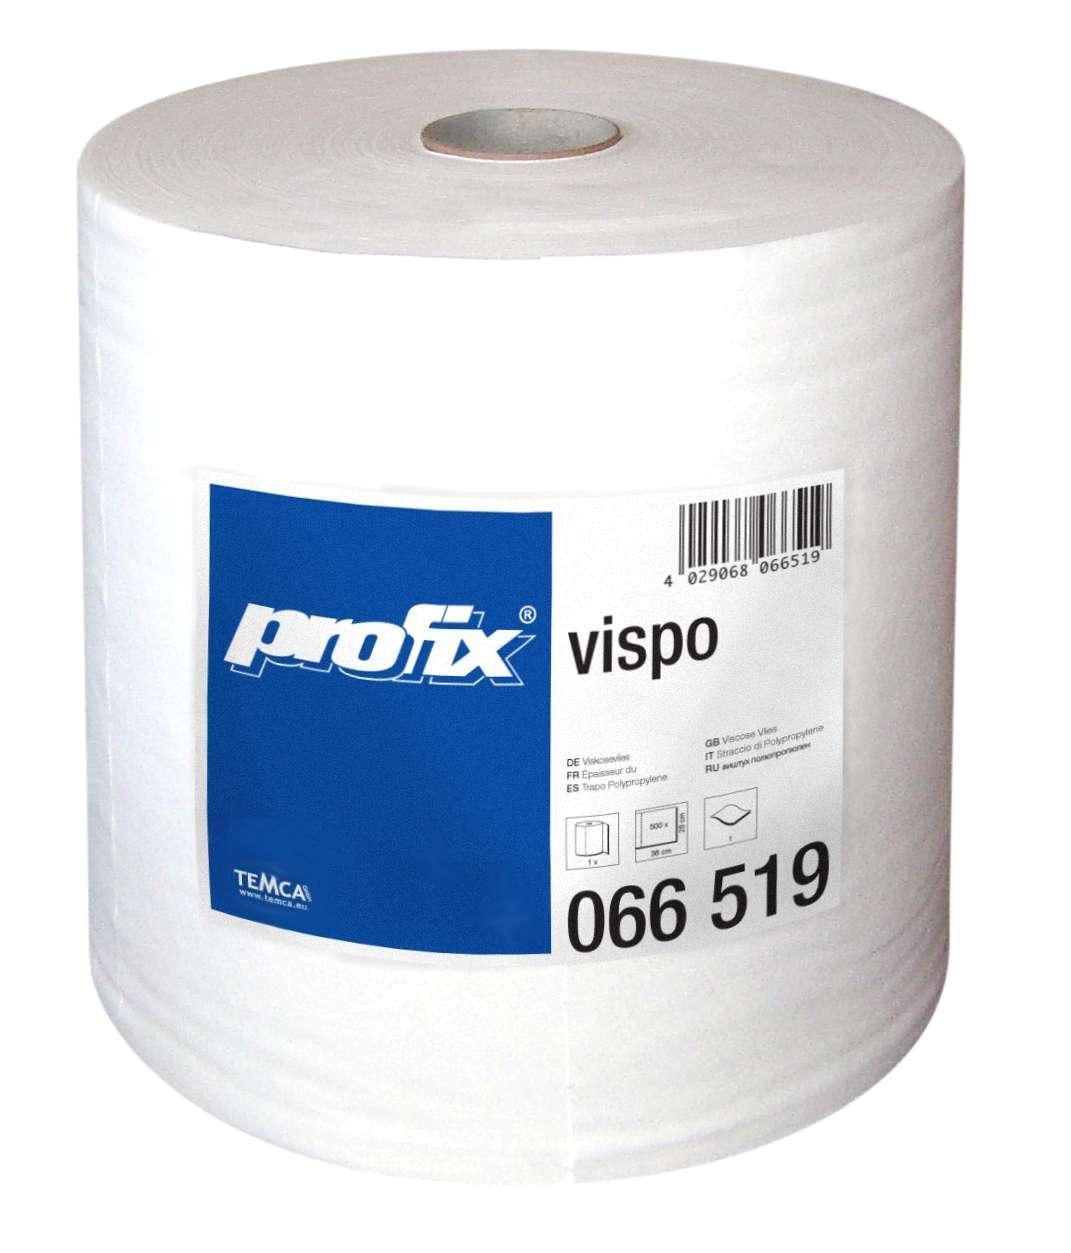 TEMCA profix vispo Poliertuchrolle 28 x 36 cm weiß Rolle a 500 Blatt